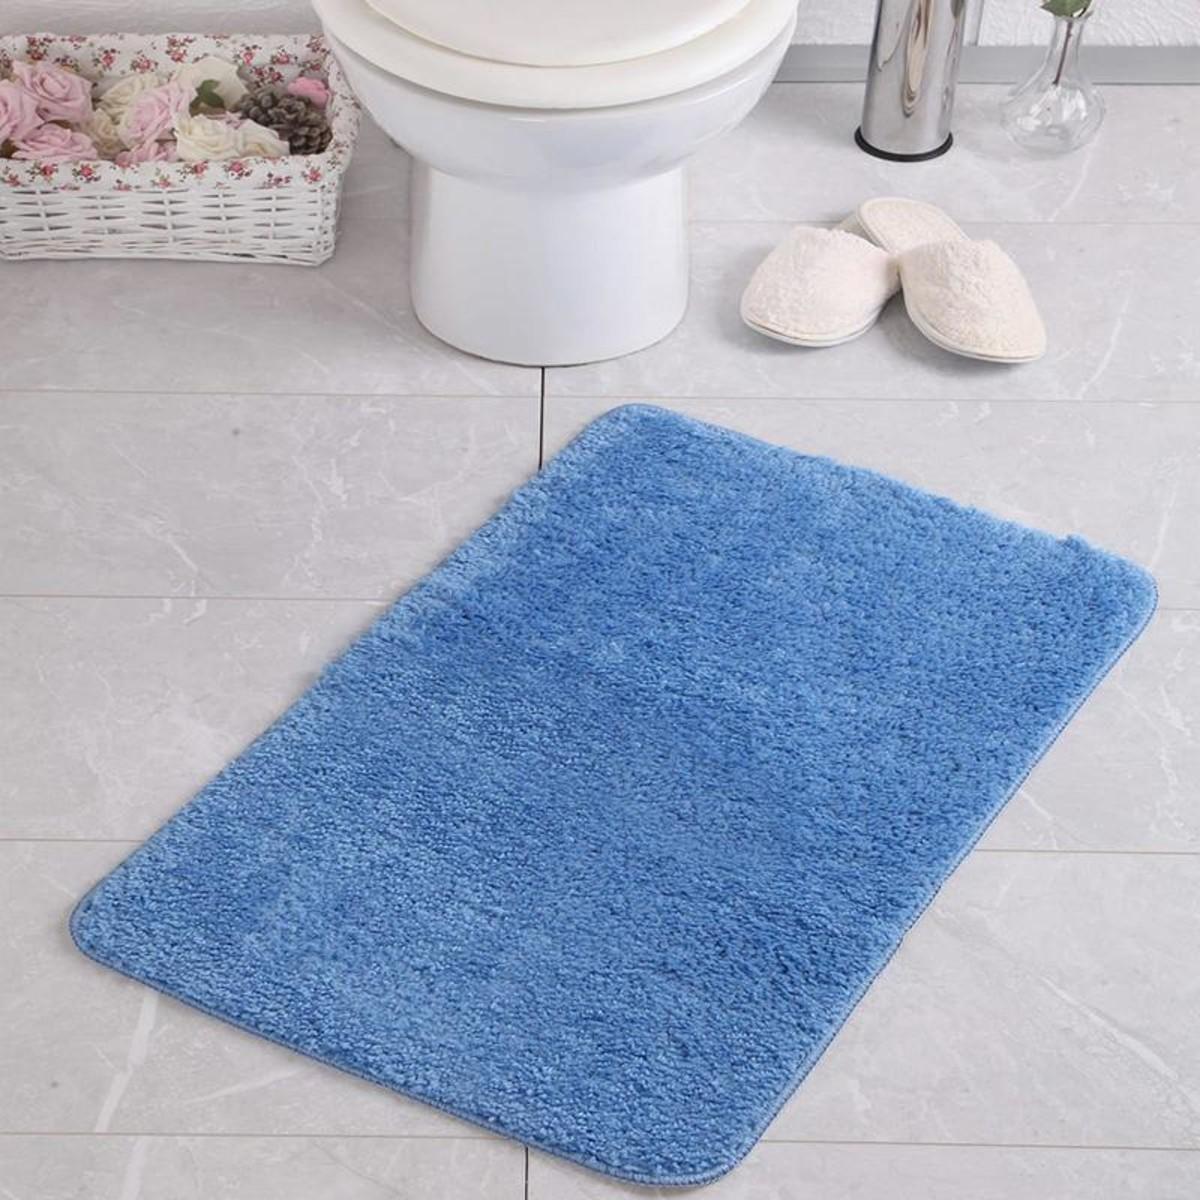 Коврик для ванной Aqua-Prime Be&#39Maks 60Х100см 509 18мм (Голубой) 1/20